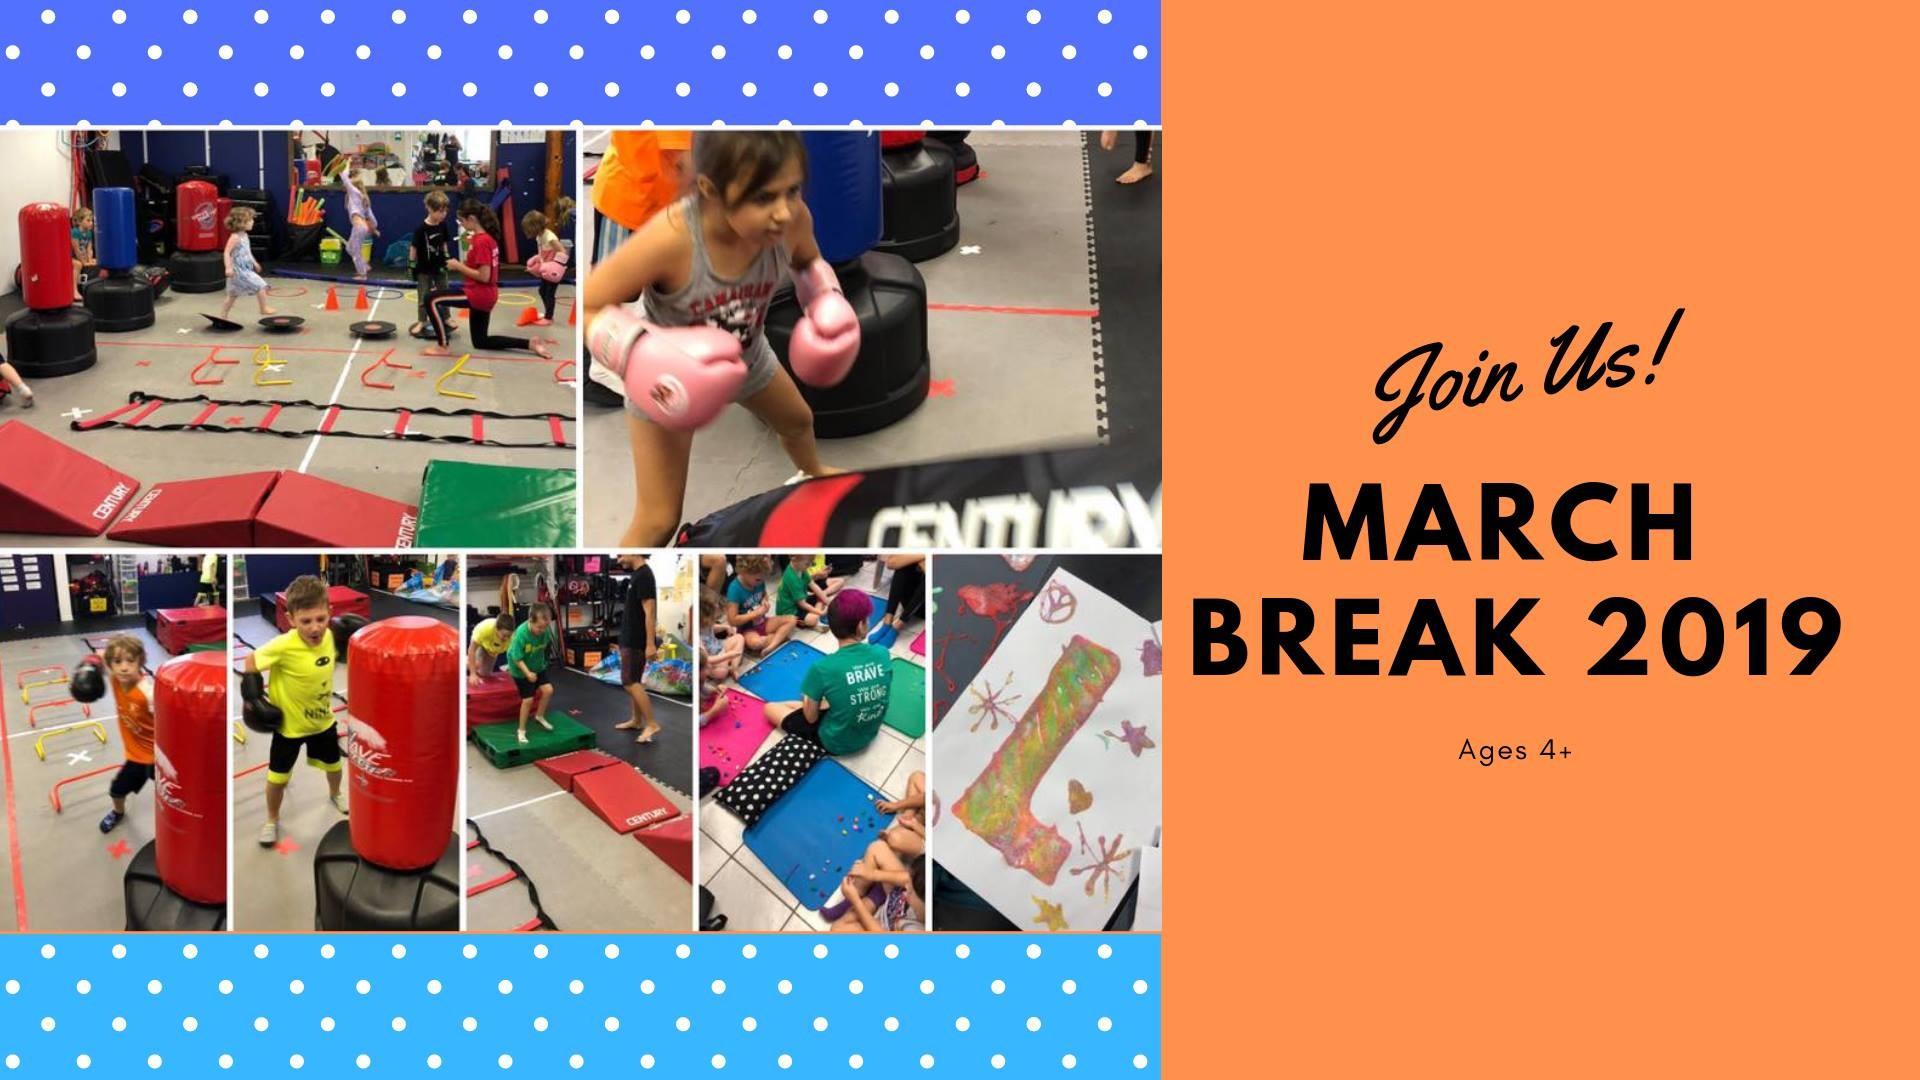 March Break 2019 Determination Martial Arts Hamilton [from 11 to 15 March ]